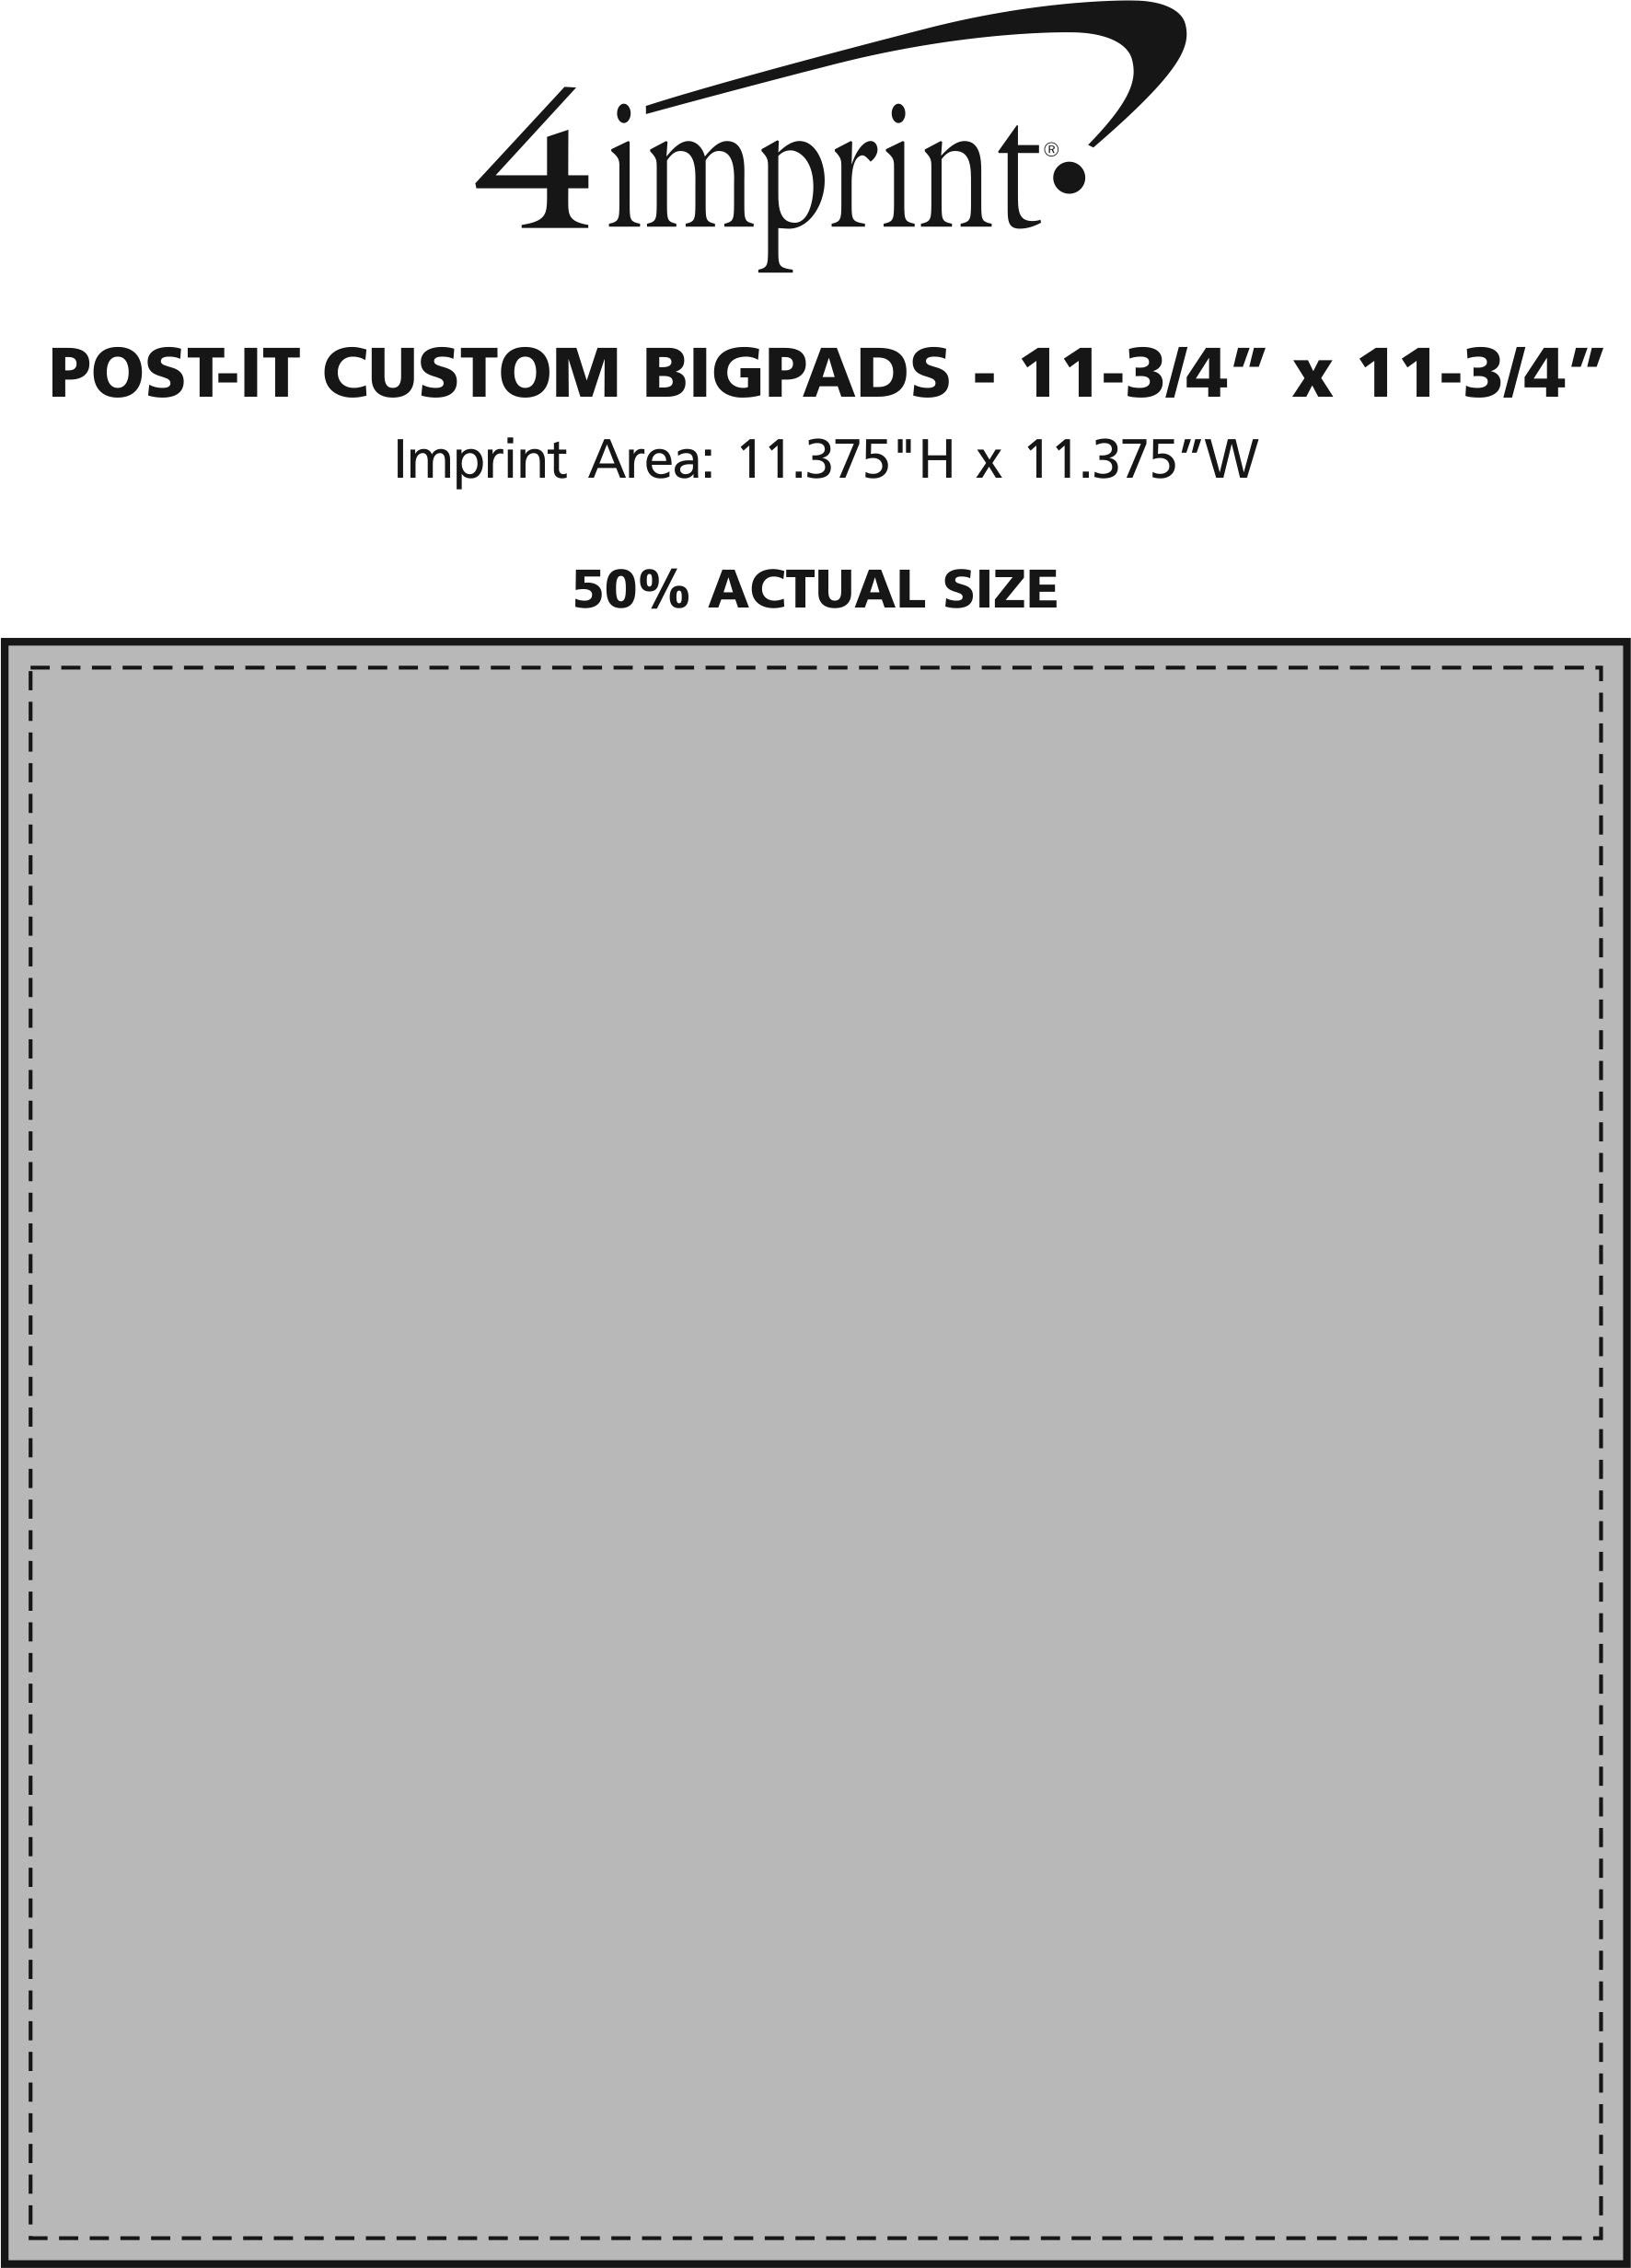 "Imprint Area of Post-it® Custom BigPads - 11-3/4"" x 11-3/4"""